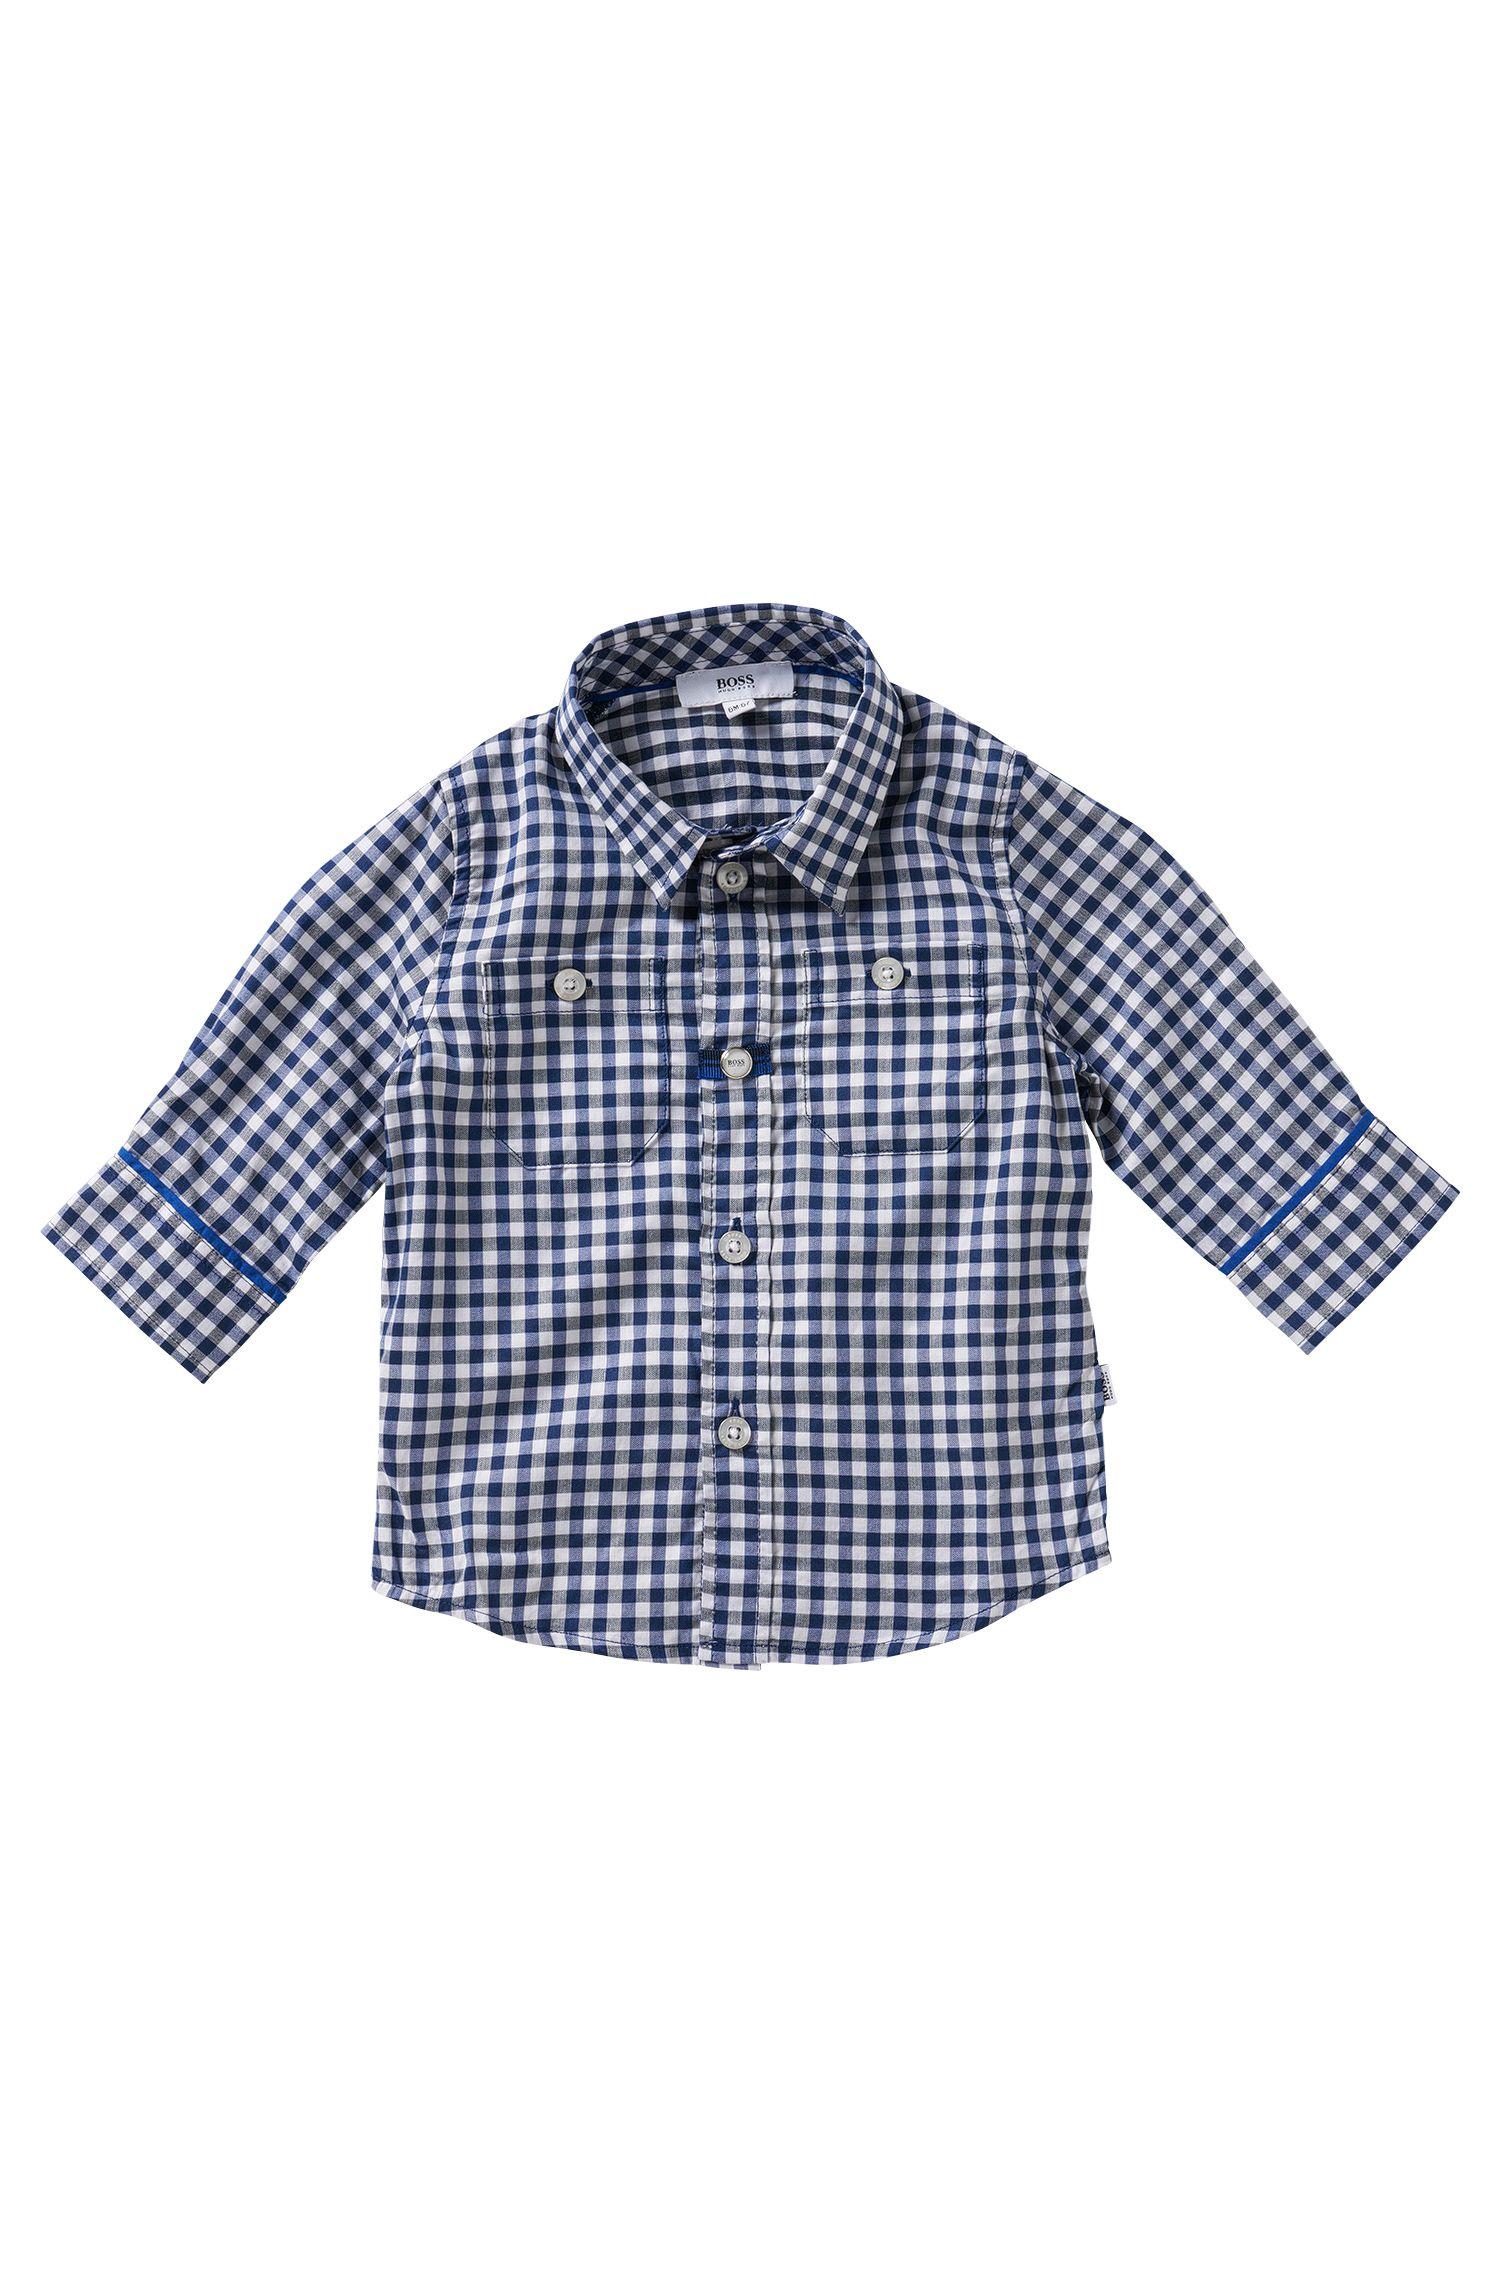 Kinderoverhemd van katoen: 'J05407'